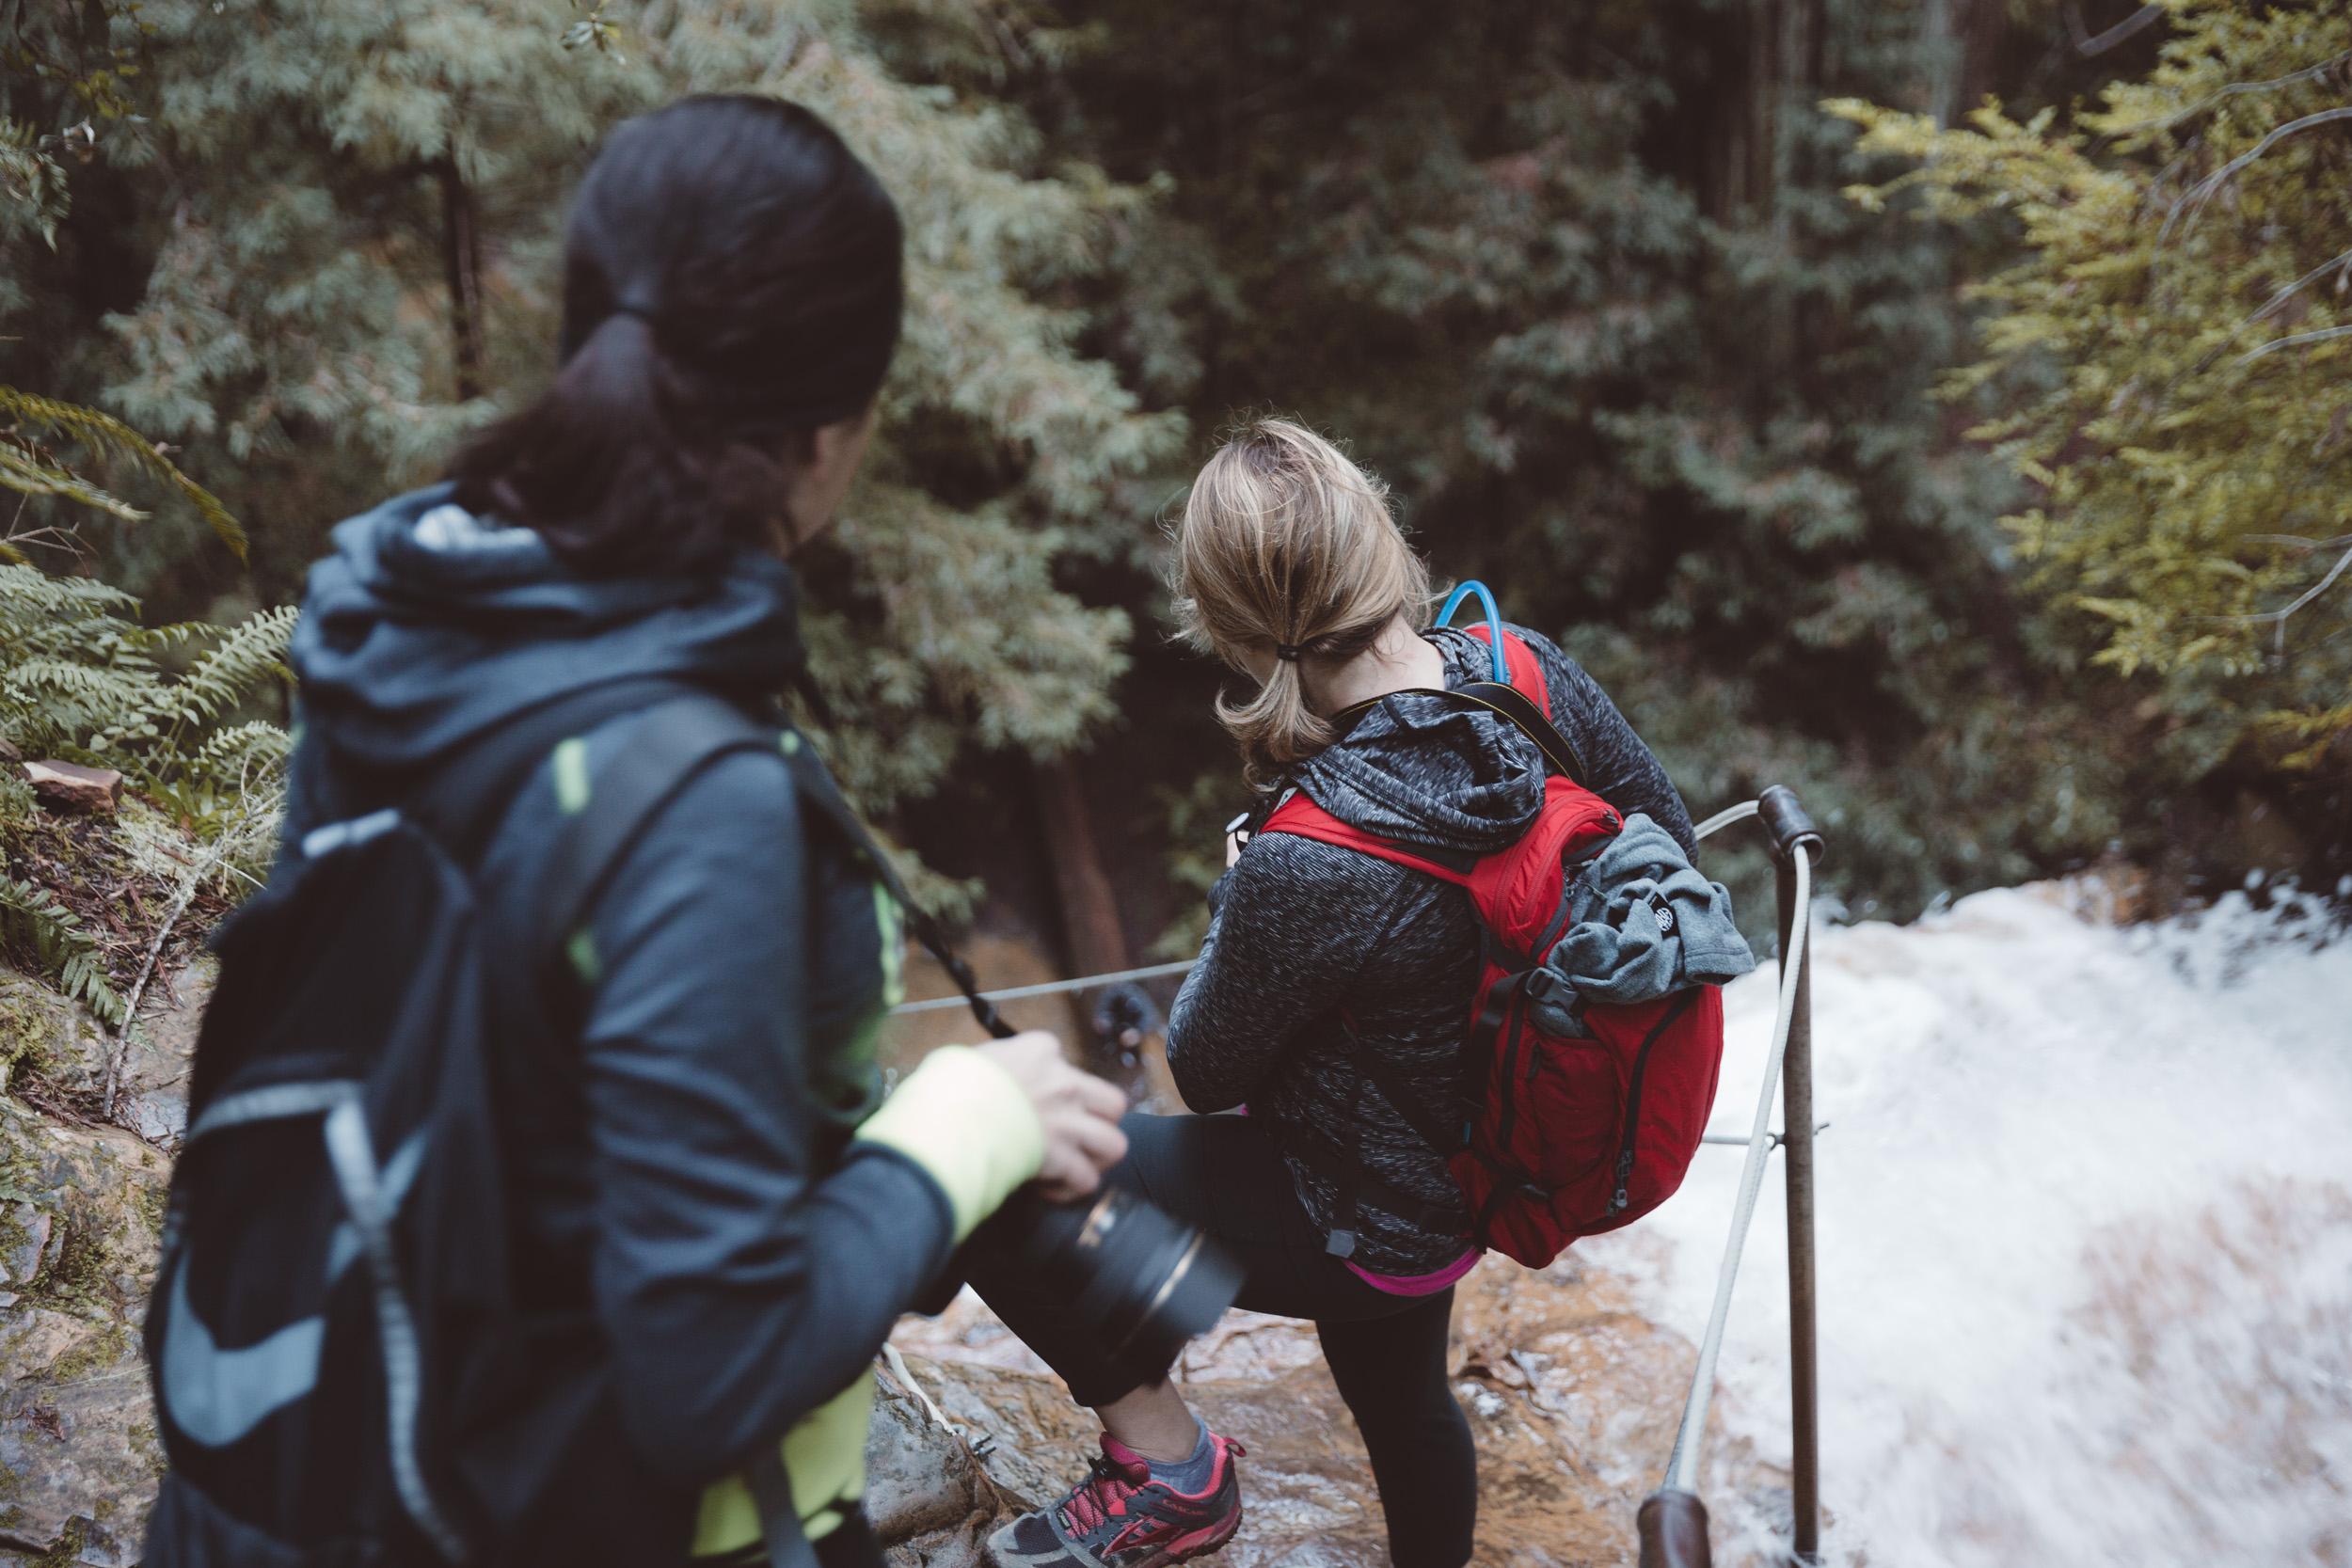 big-basin-silver-falls-descent-hike-and-shoot-1.jpg